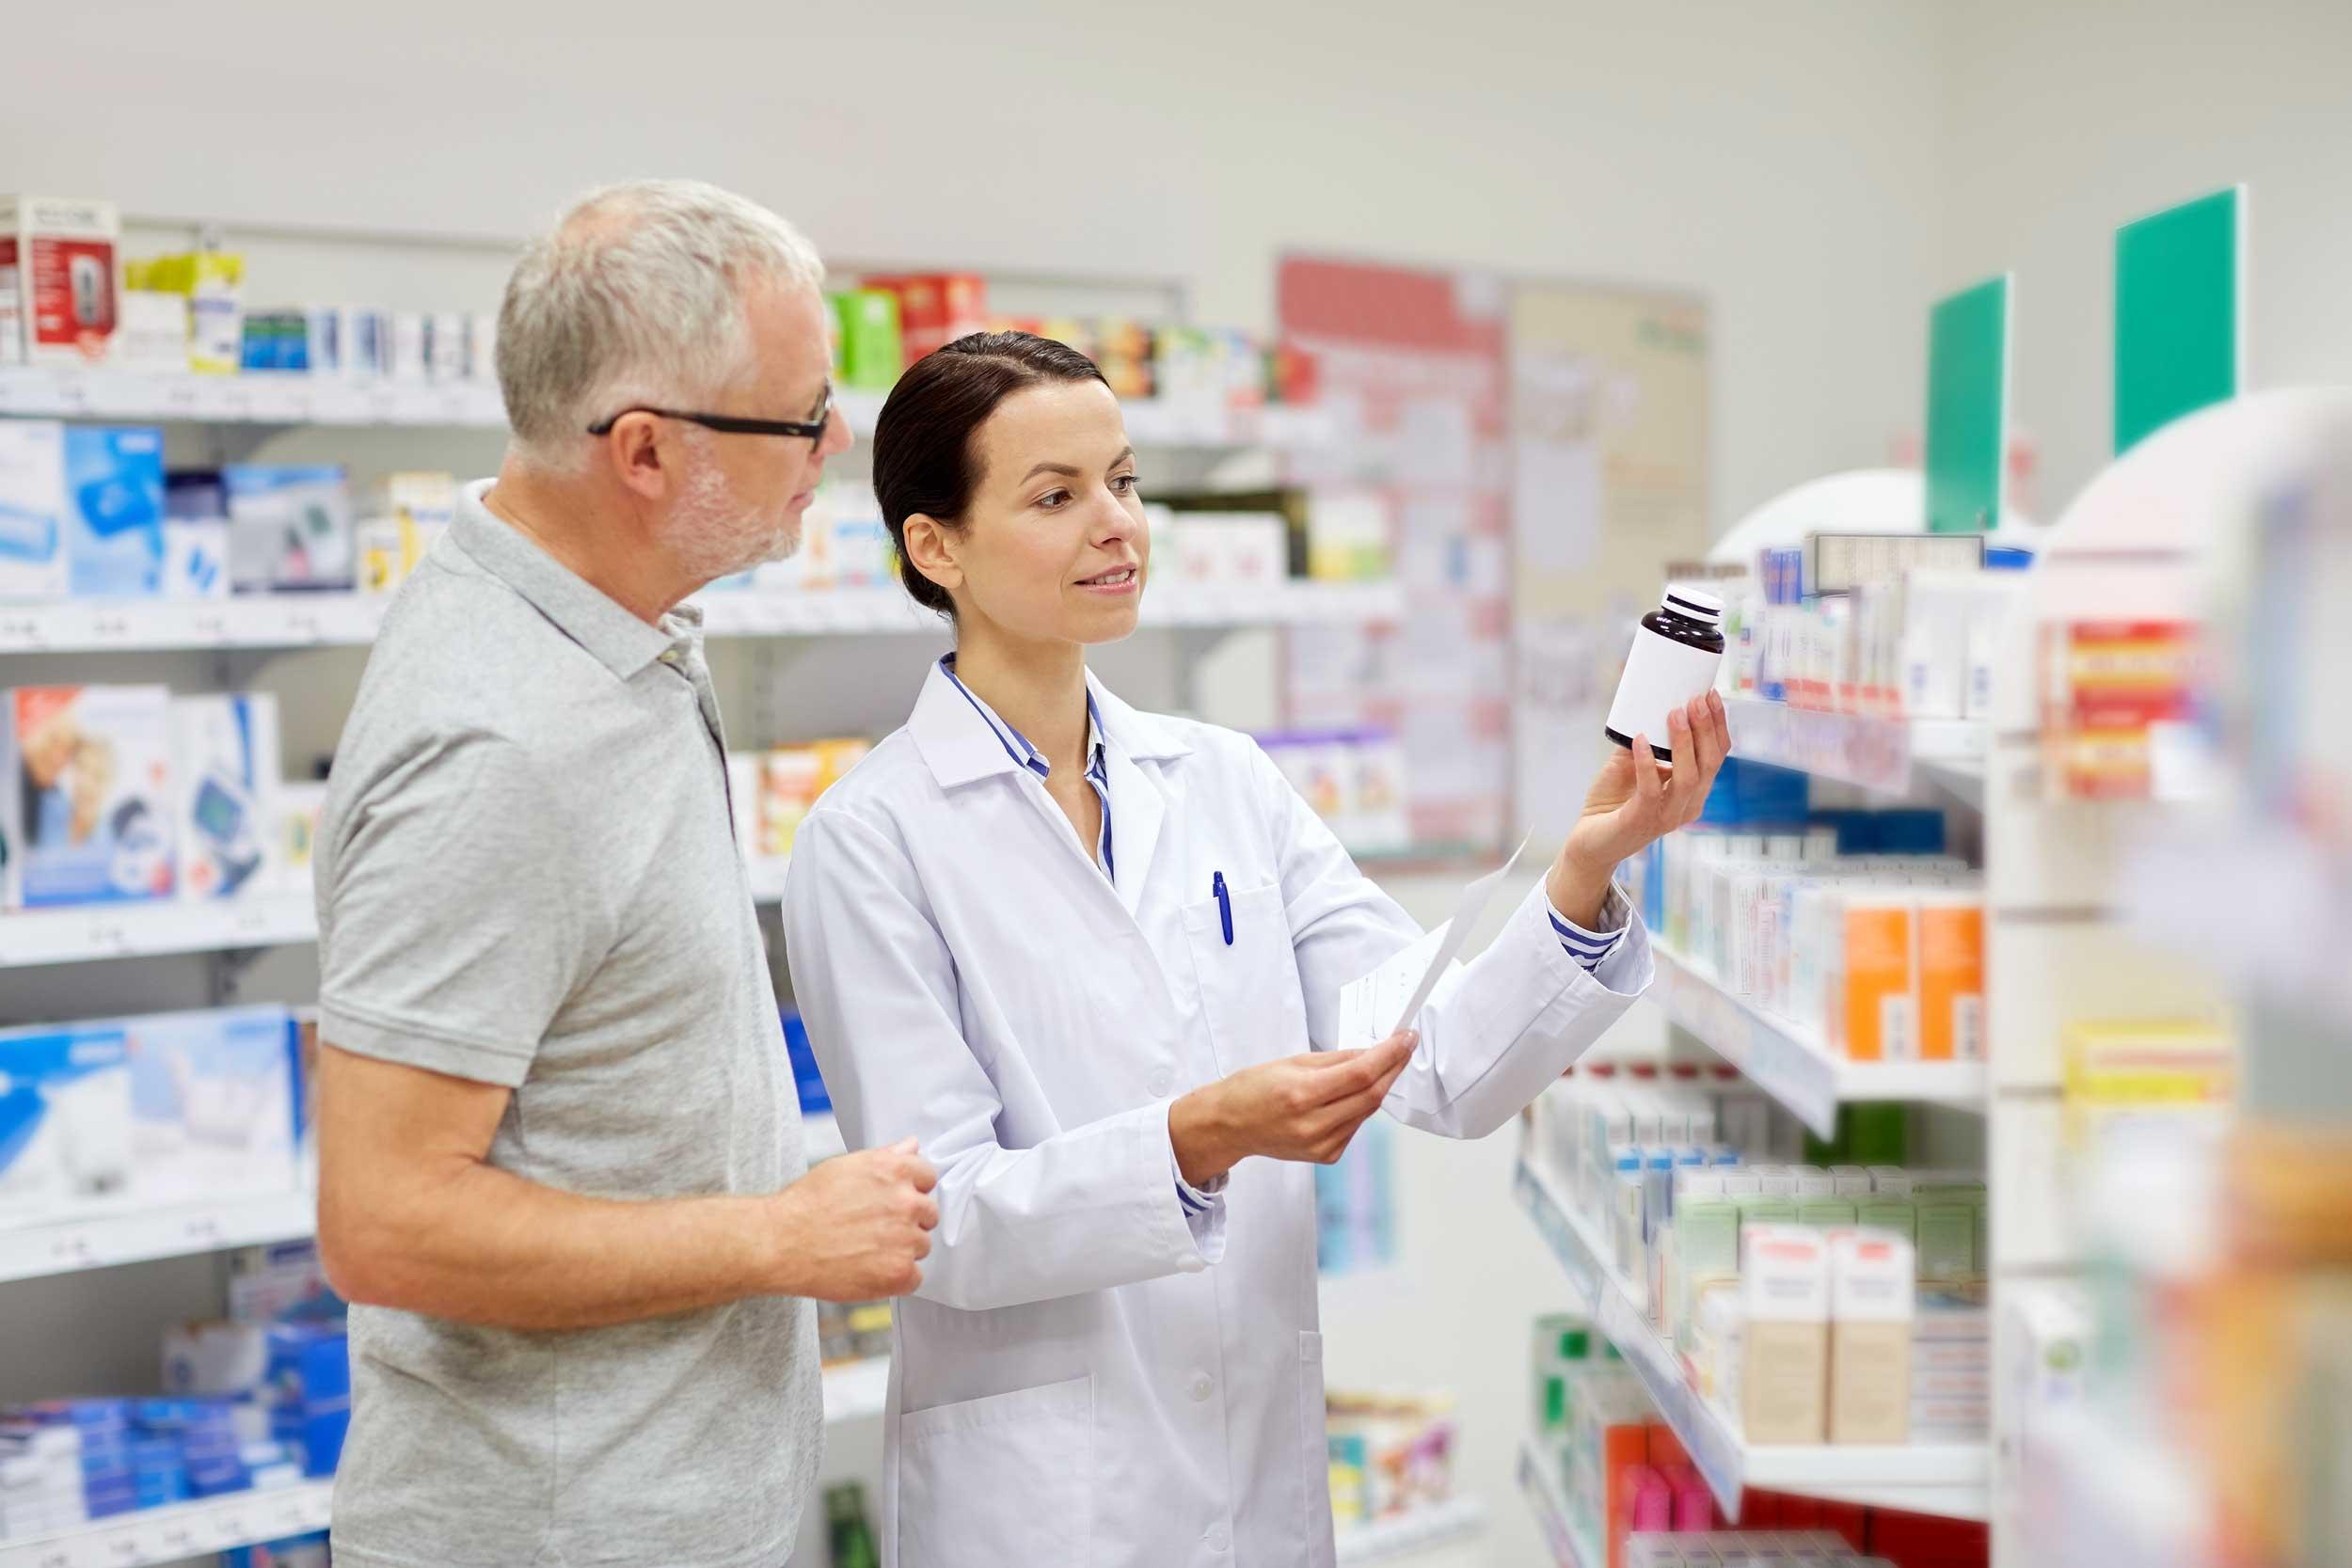 Best Entry Level Healthcare Jobs in Australia